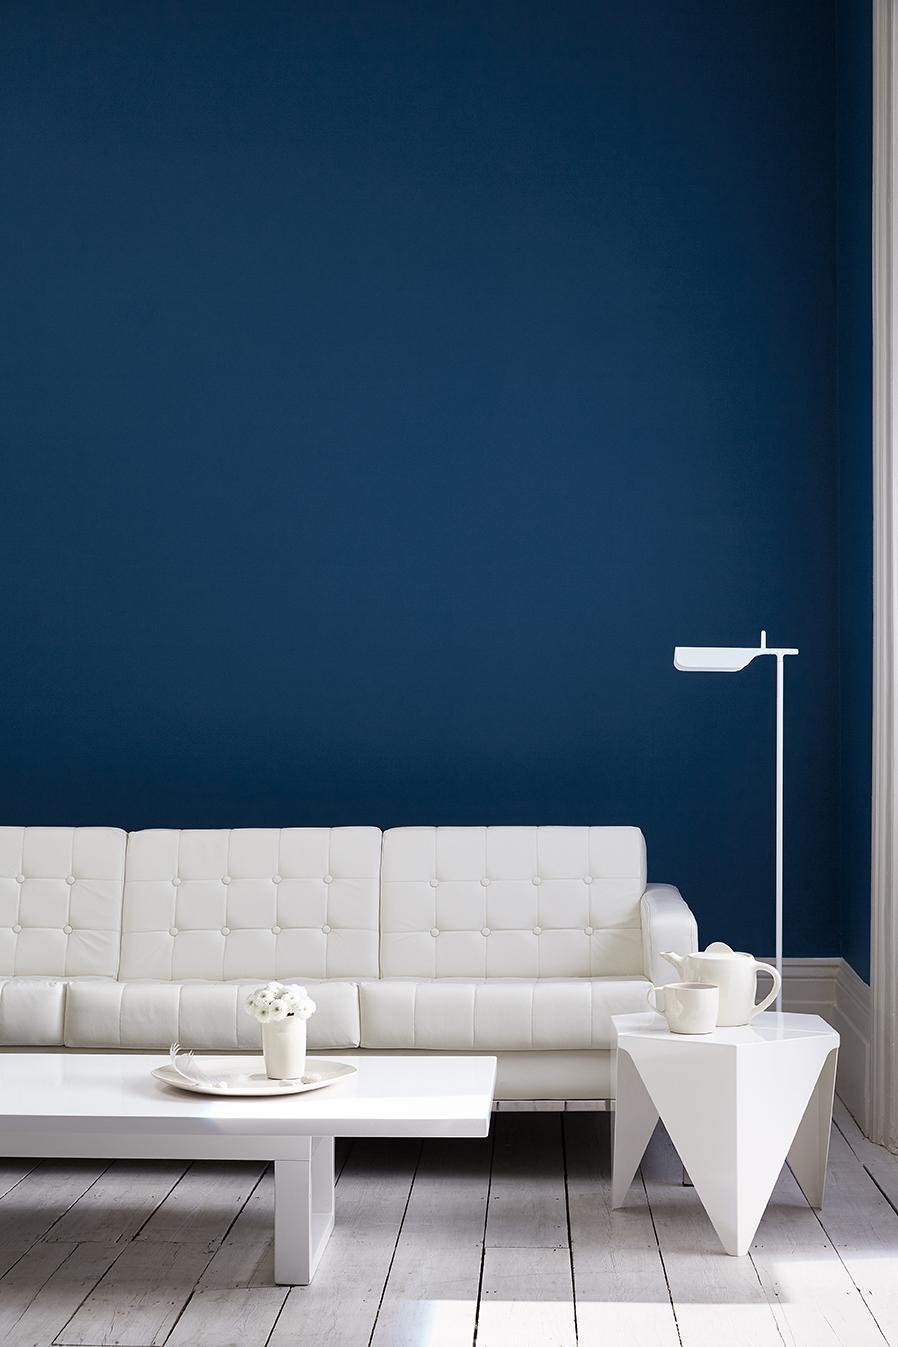 Interieur blauwe muurverf Little Greene met witte houten vloer